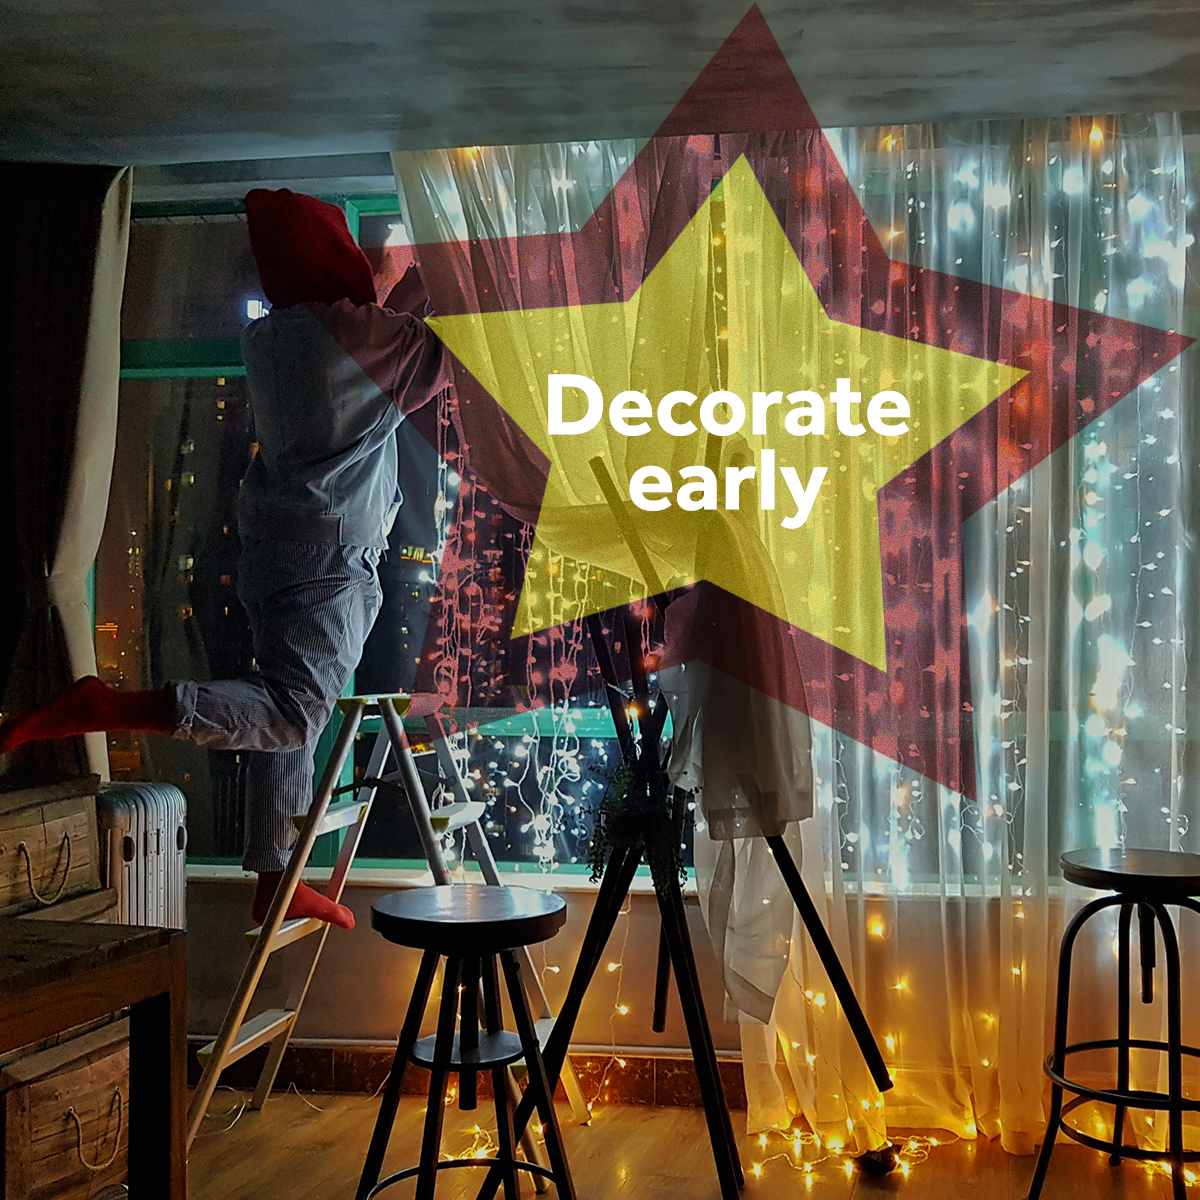 Festive Spirit - Decorate Early